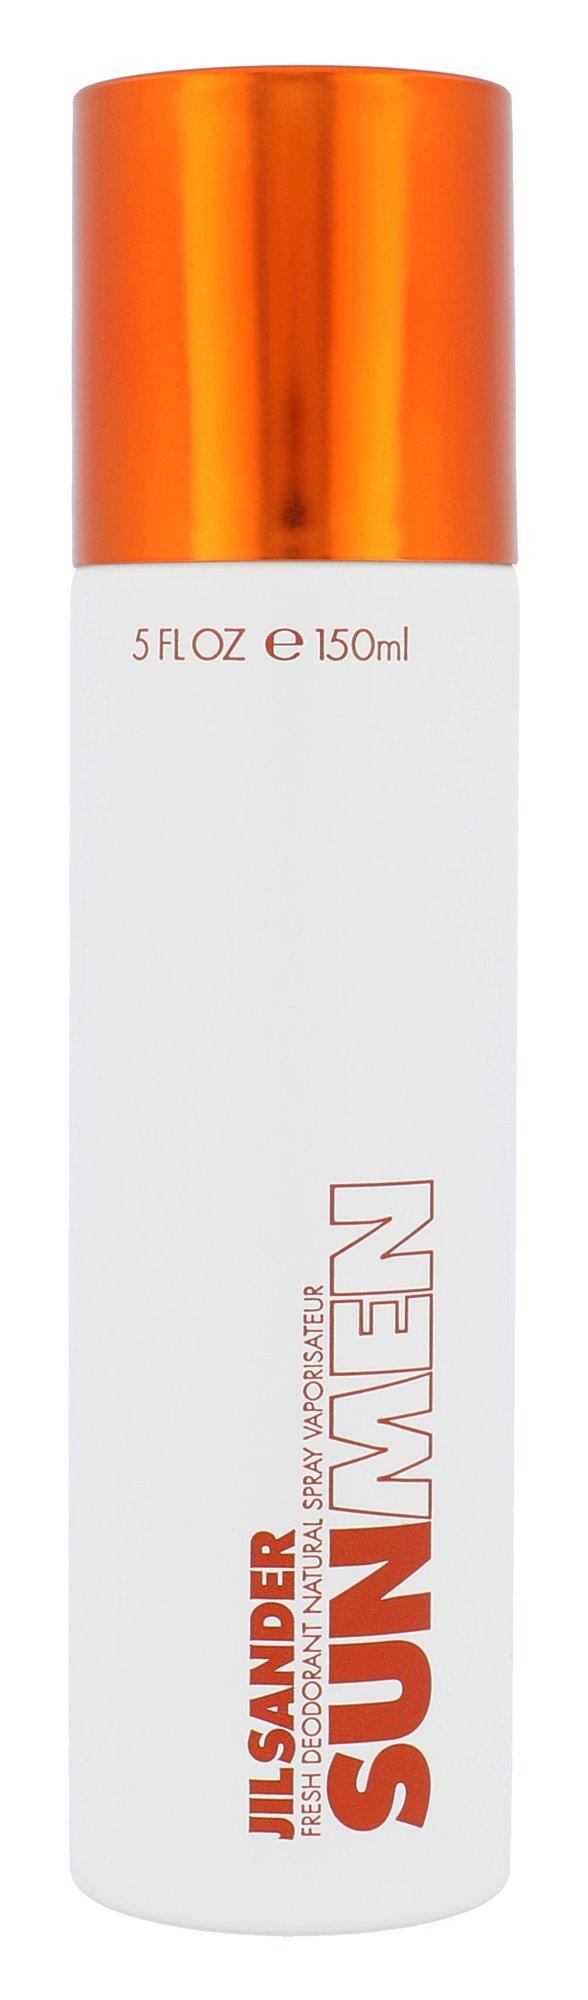 Jil Sander Sun Deodorant 150ml